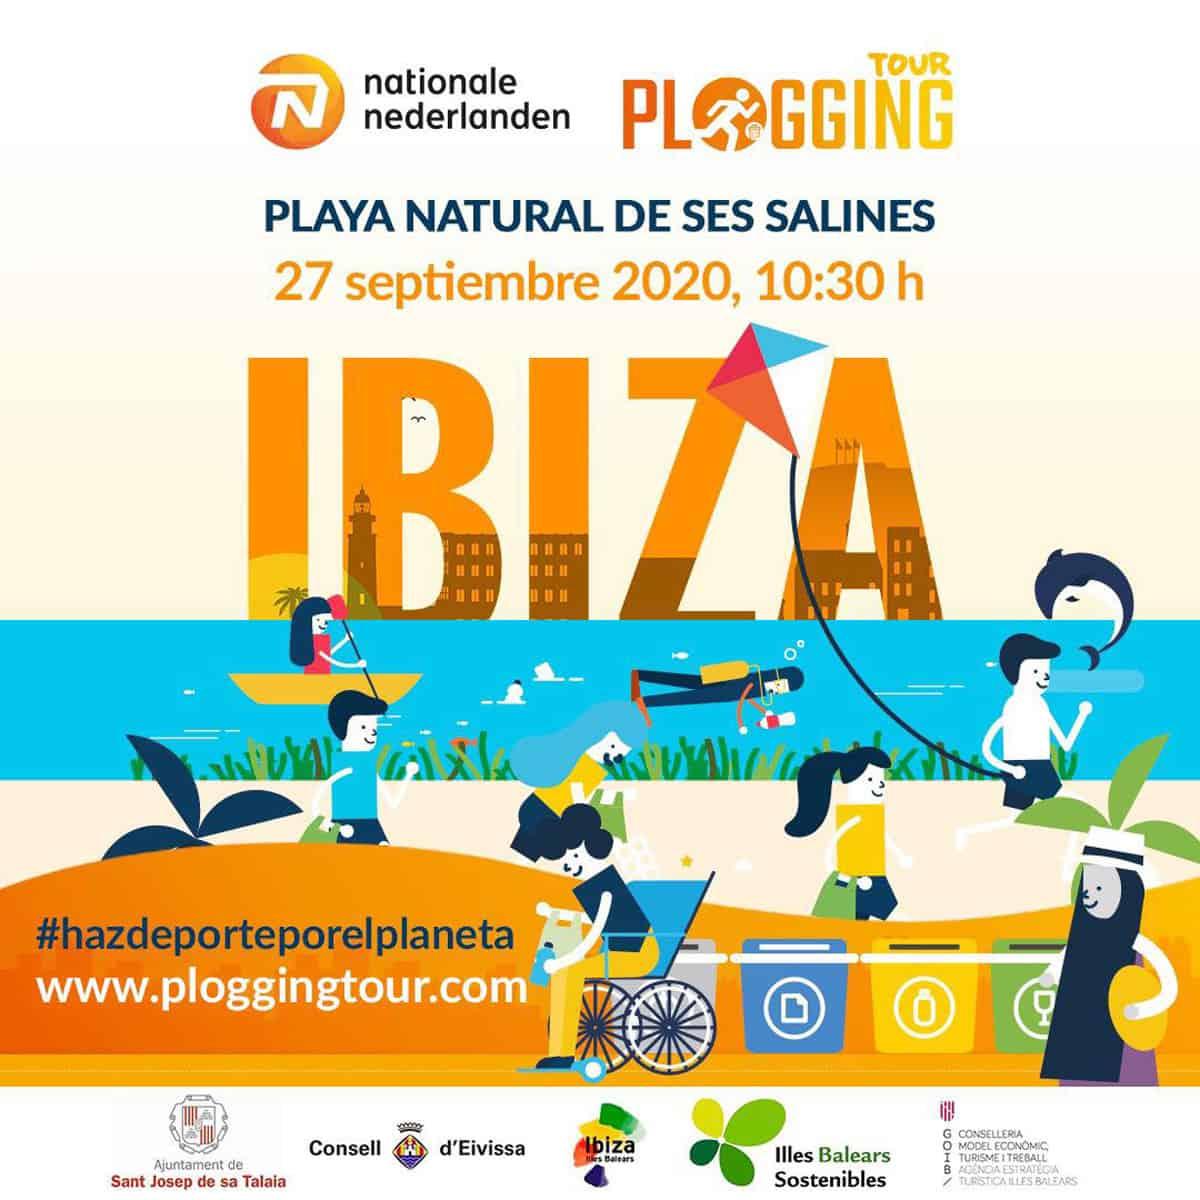 ibiza-plogging-tour-las-salinas-2020-welcometoibiza